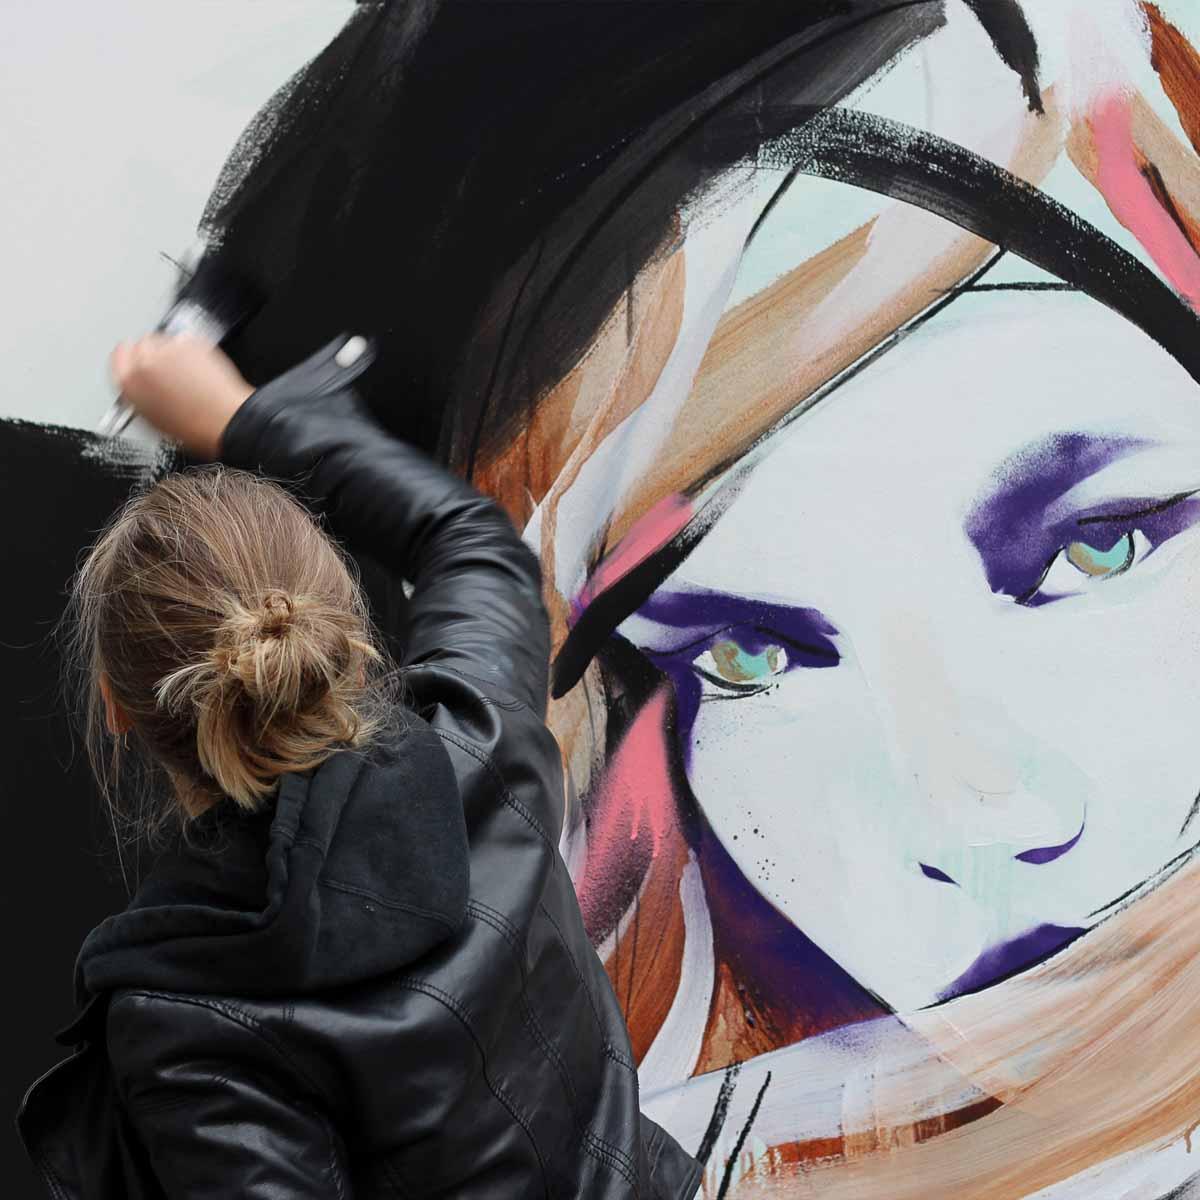 Stroke Artfair München 7